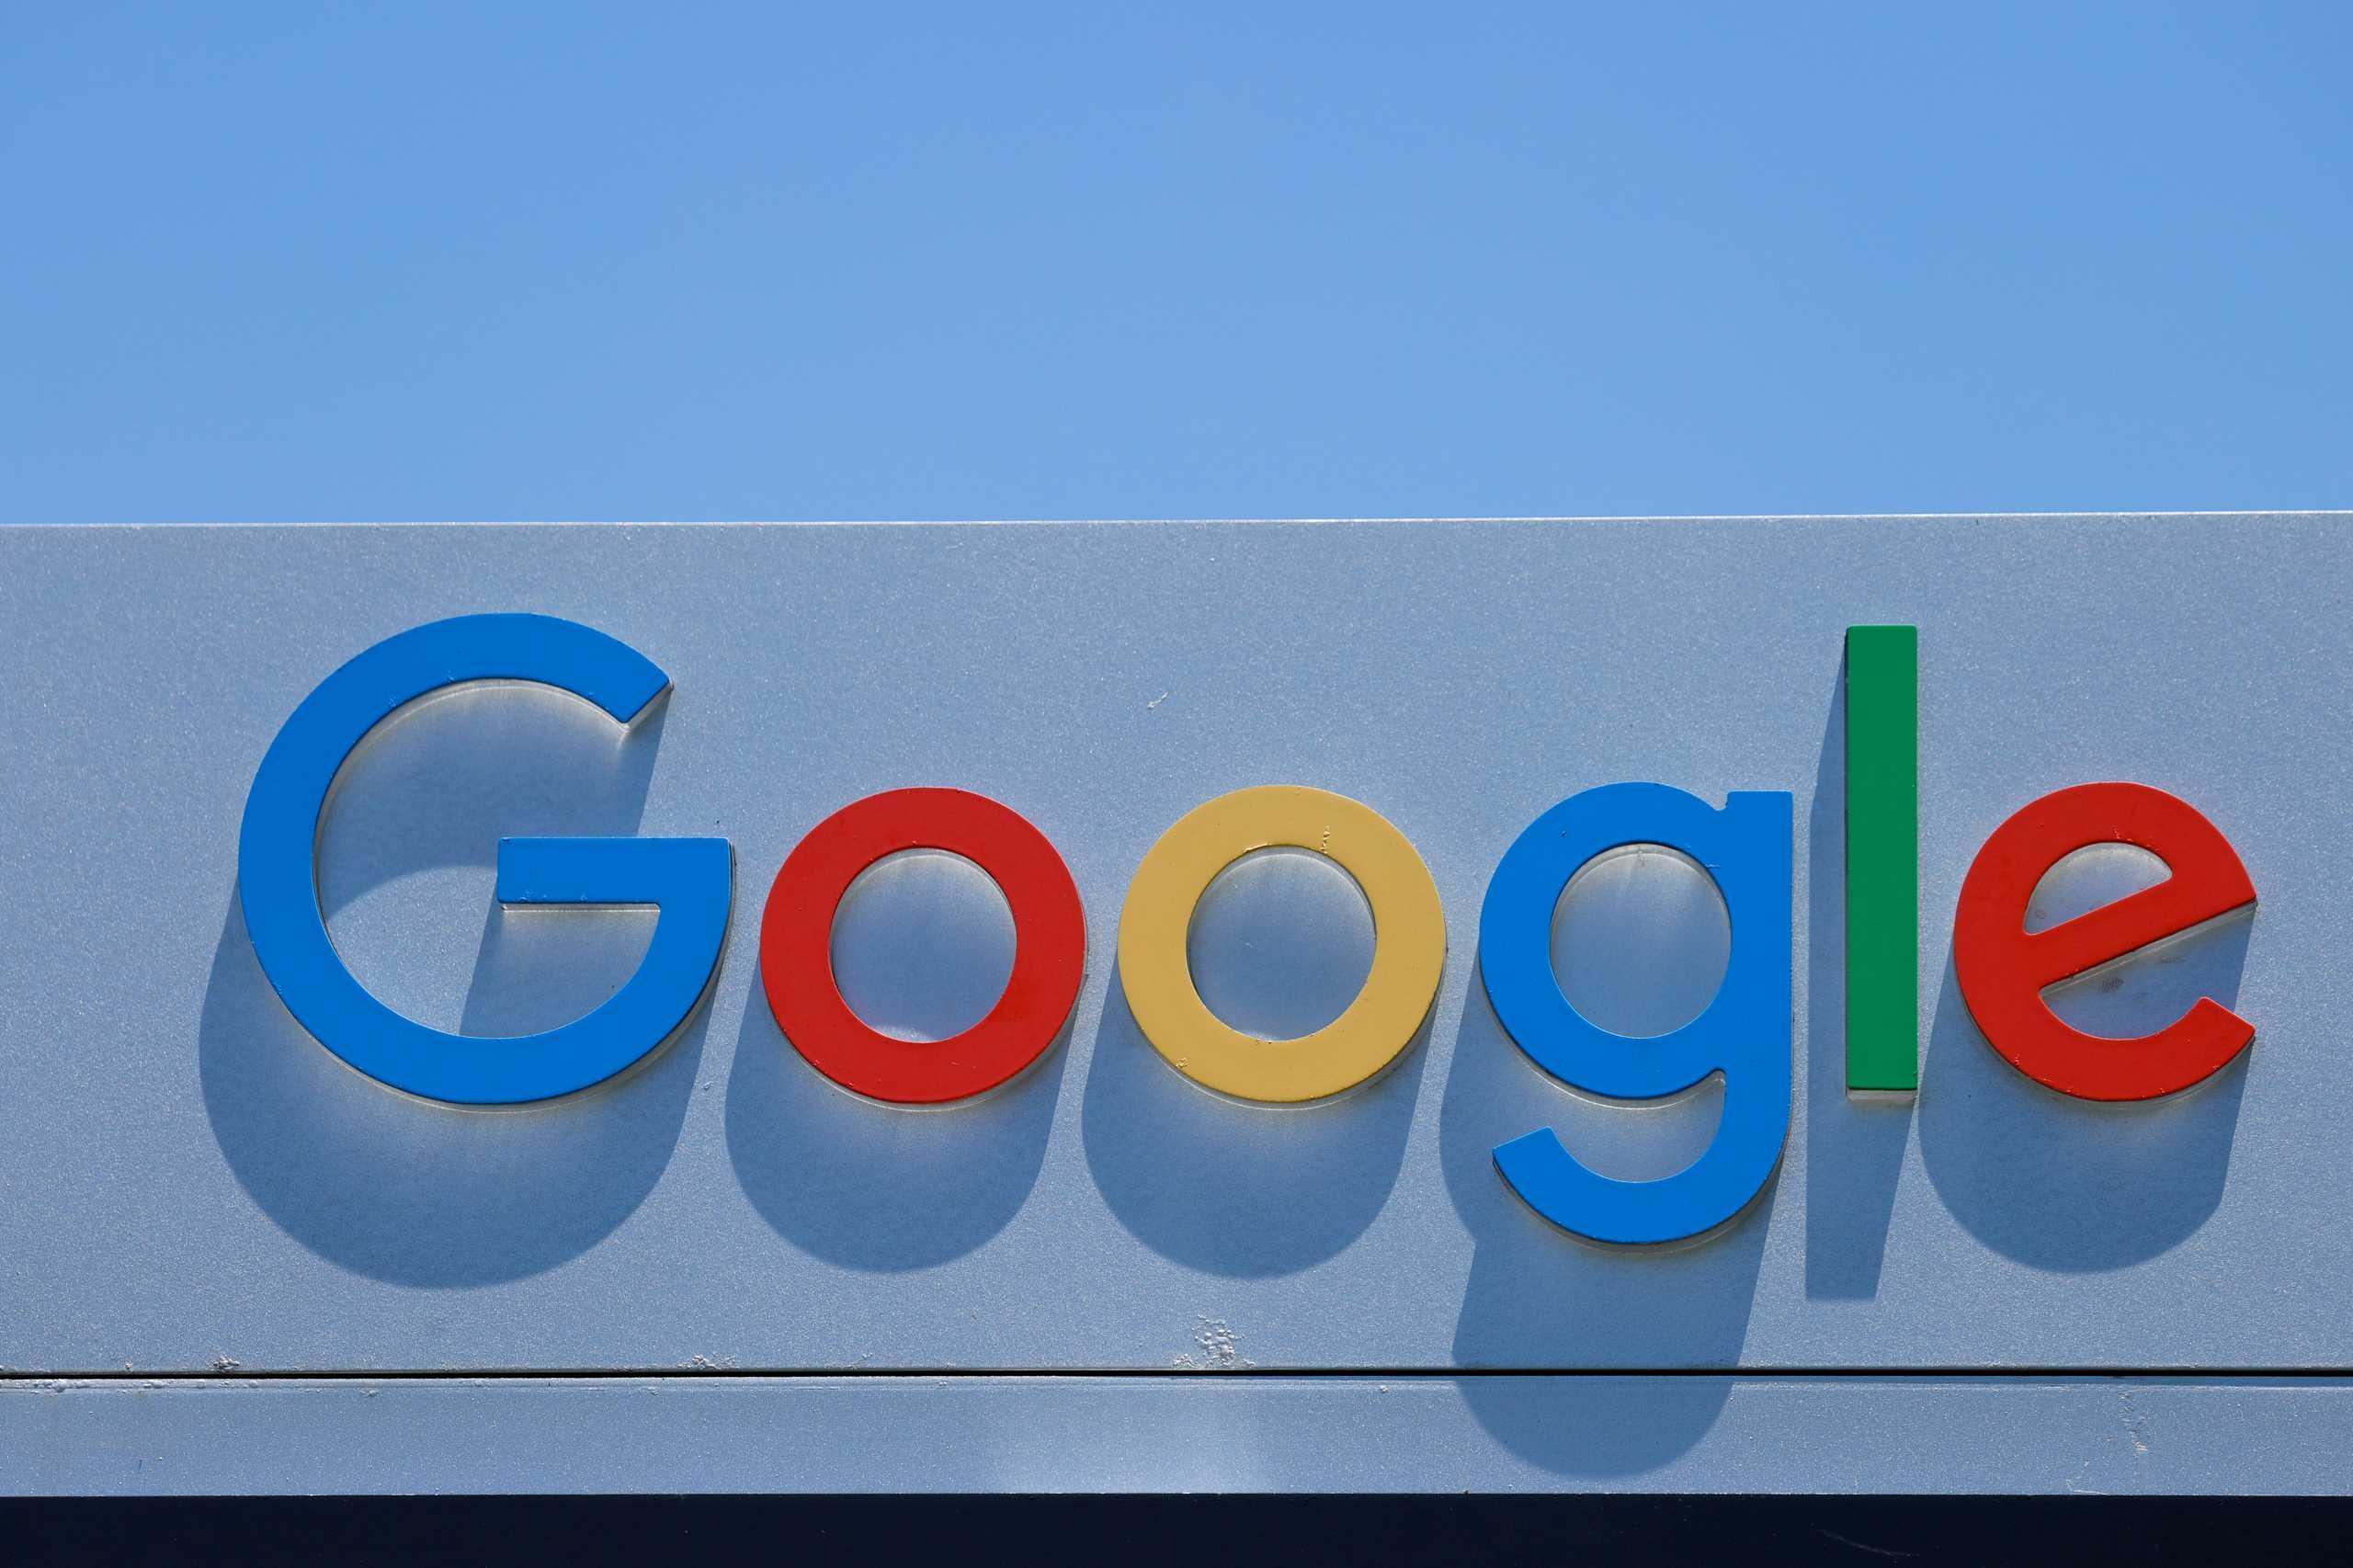 Google: Επανέρχονται σταδιακά οι υπηρεσίες της